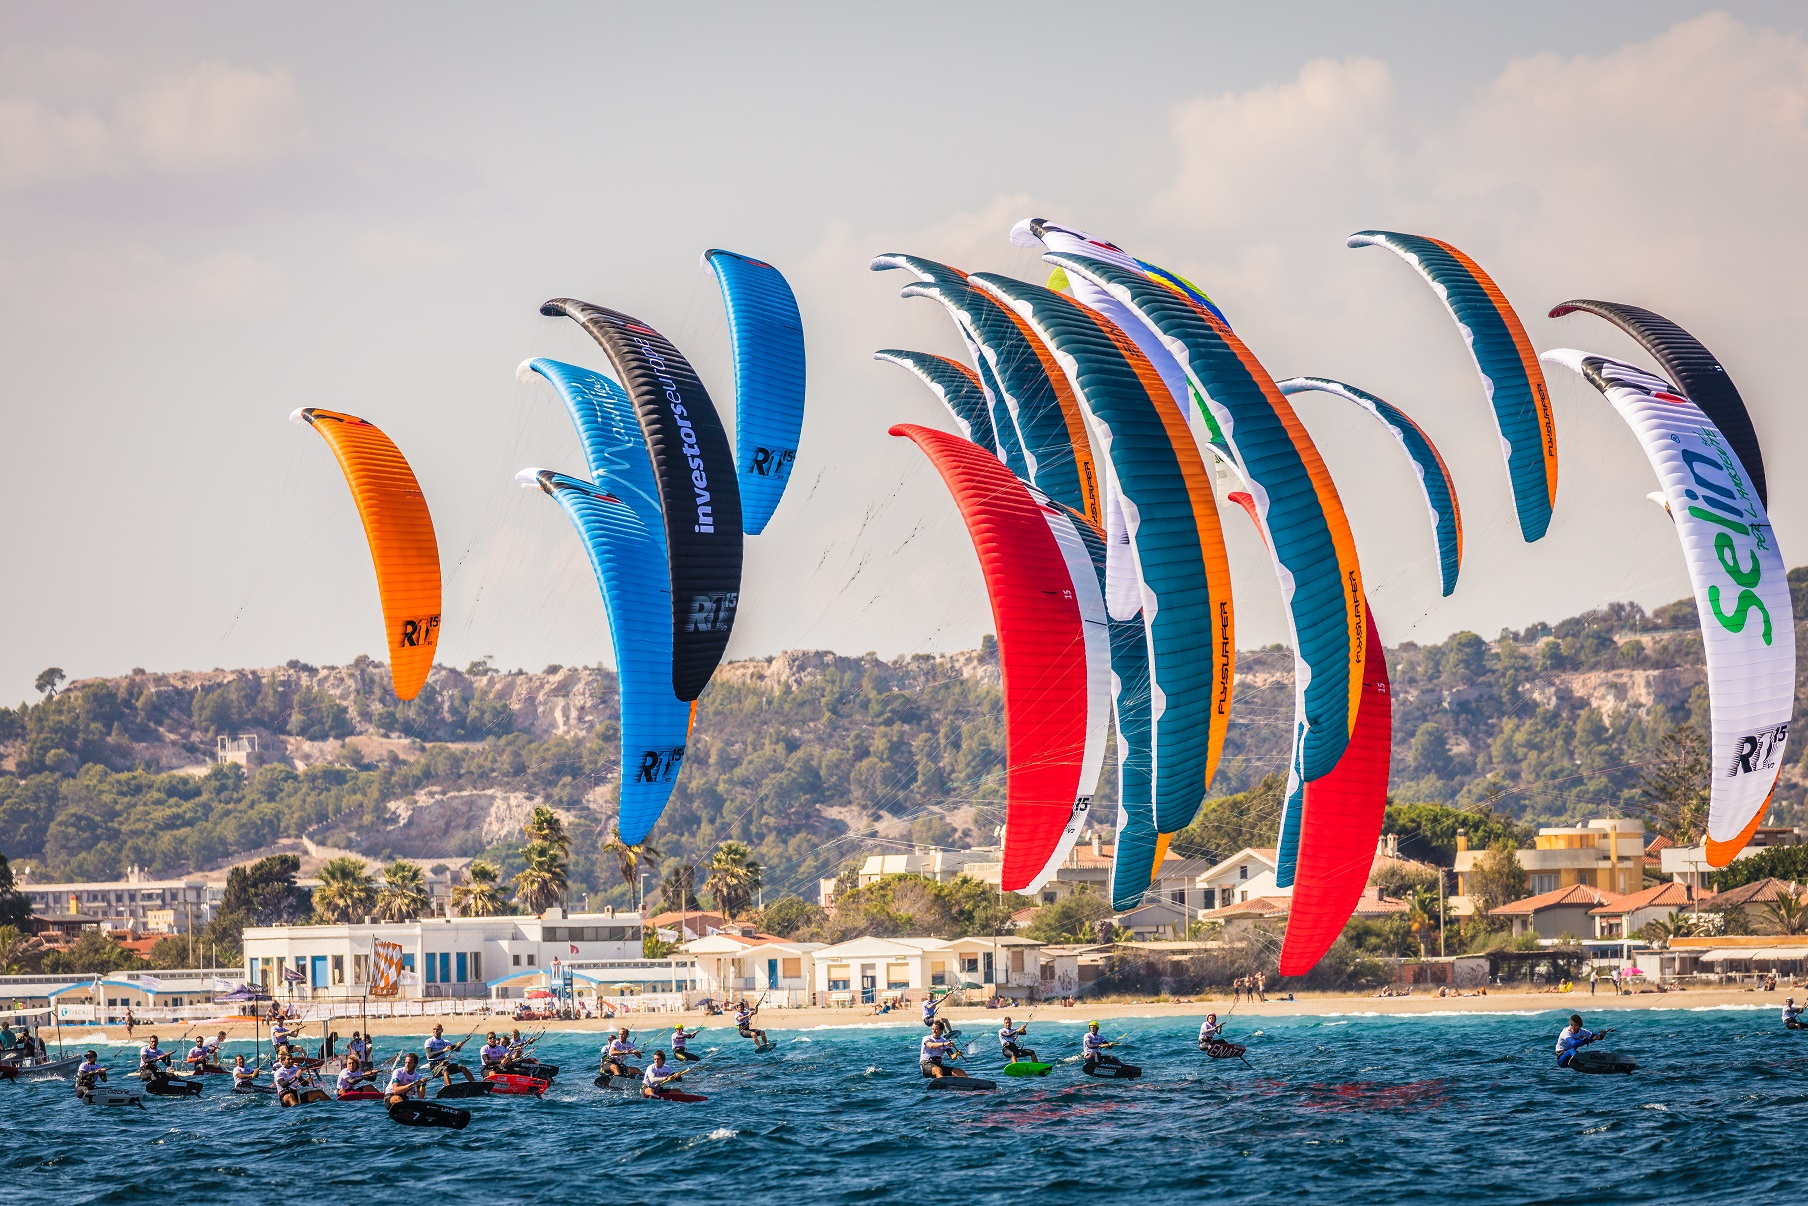 Sardinia Kitesurfing Spots: Kitesurfing Cagliari, Kite Foil World Champioships 2017